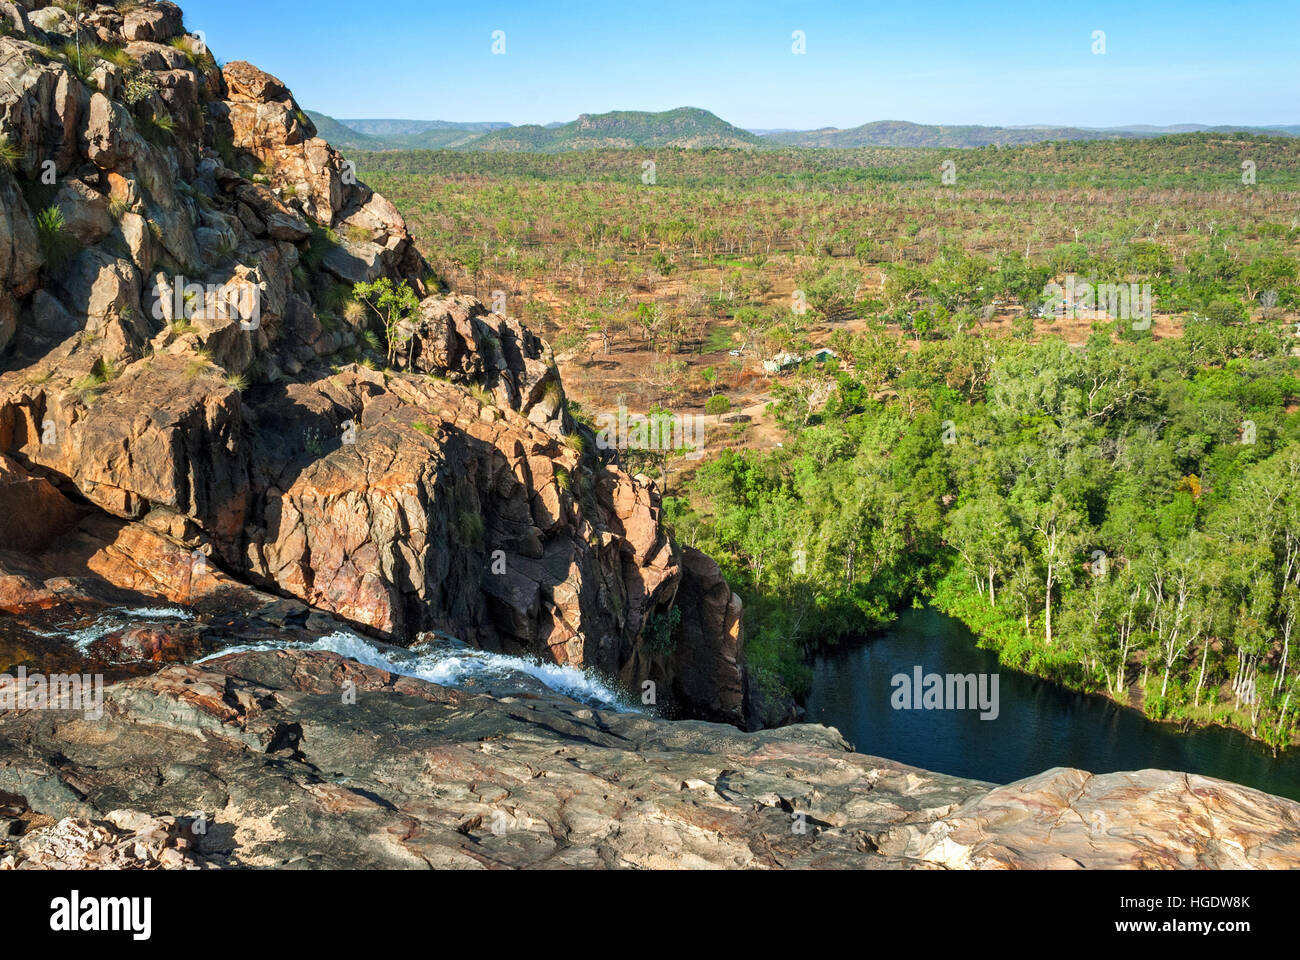 Parque Nacional Kakadu (Territorio del Norte de Australia) paisaje cerca de Gunlom lookout Foto de stock